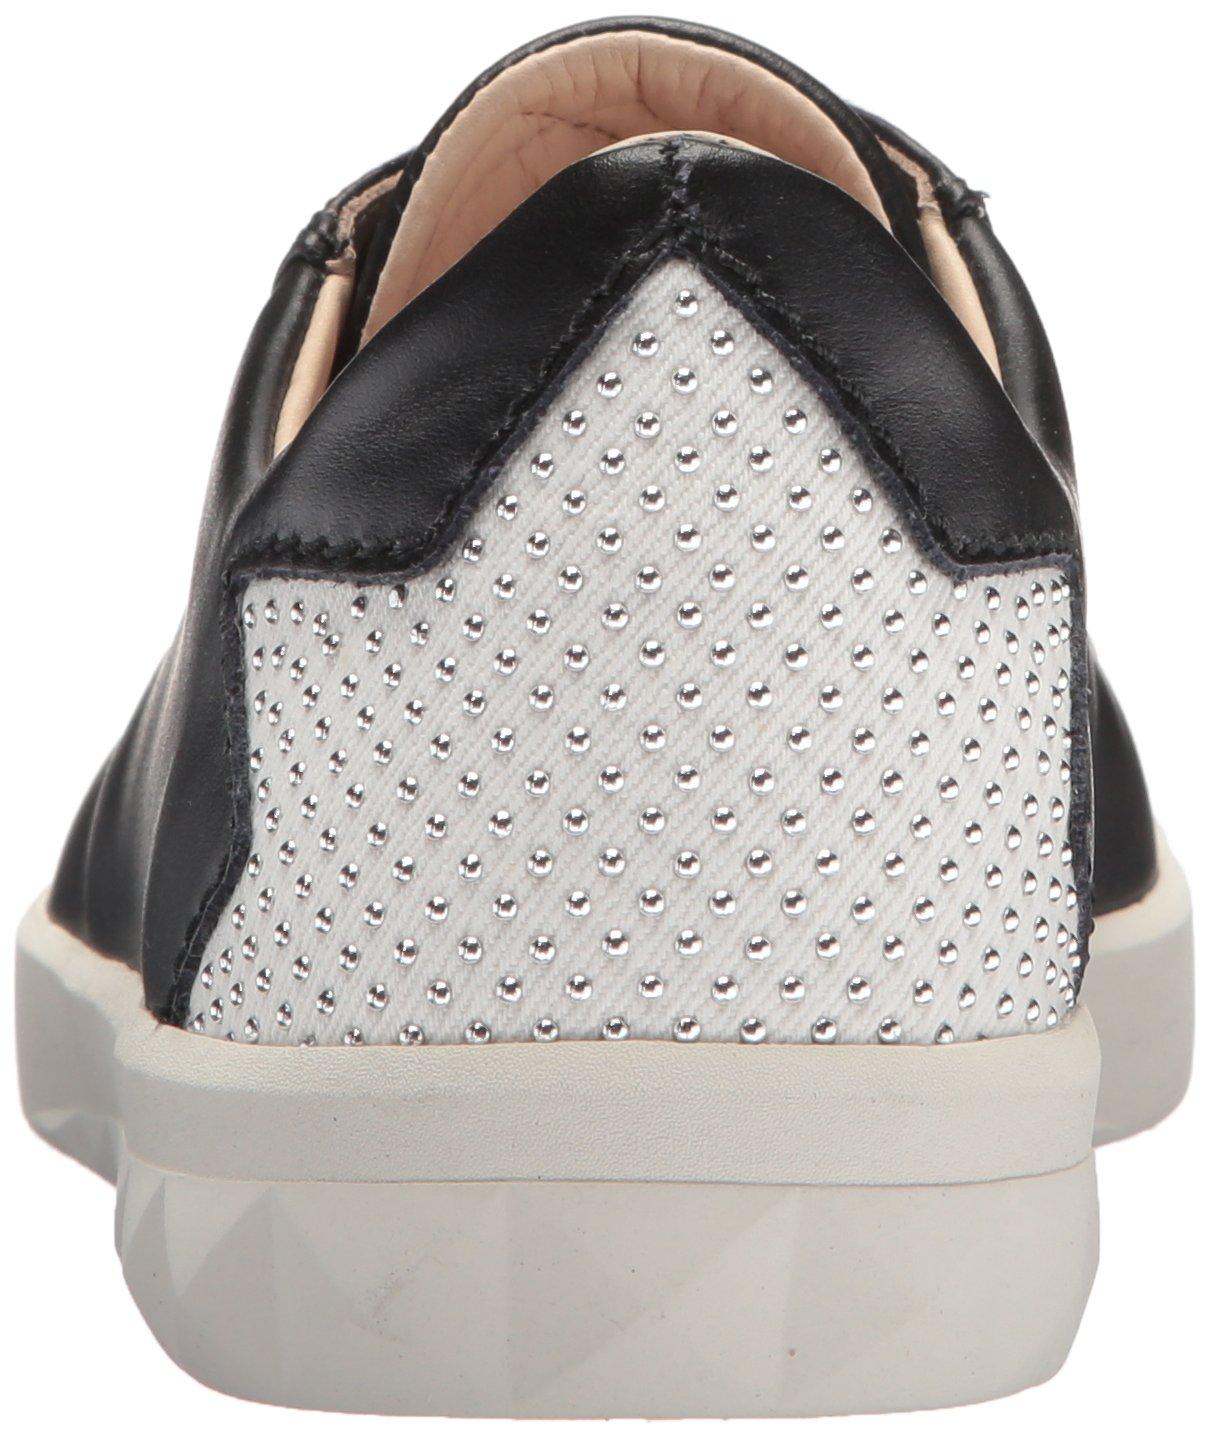 Diesel Women's Solstice S-Olstice 6 Low W Sneaker B074MMWPHS 6 S-Olstice B(M) US|Black 1 0e6d93